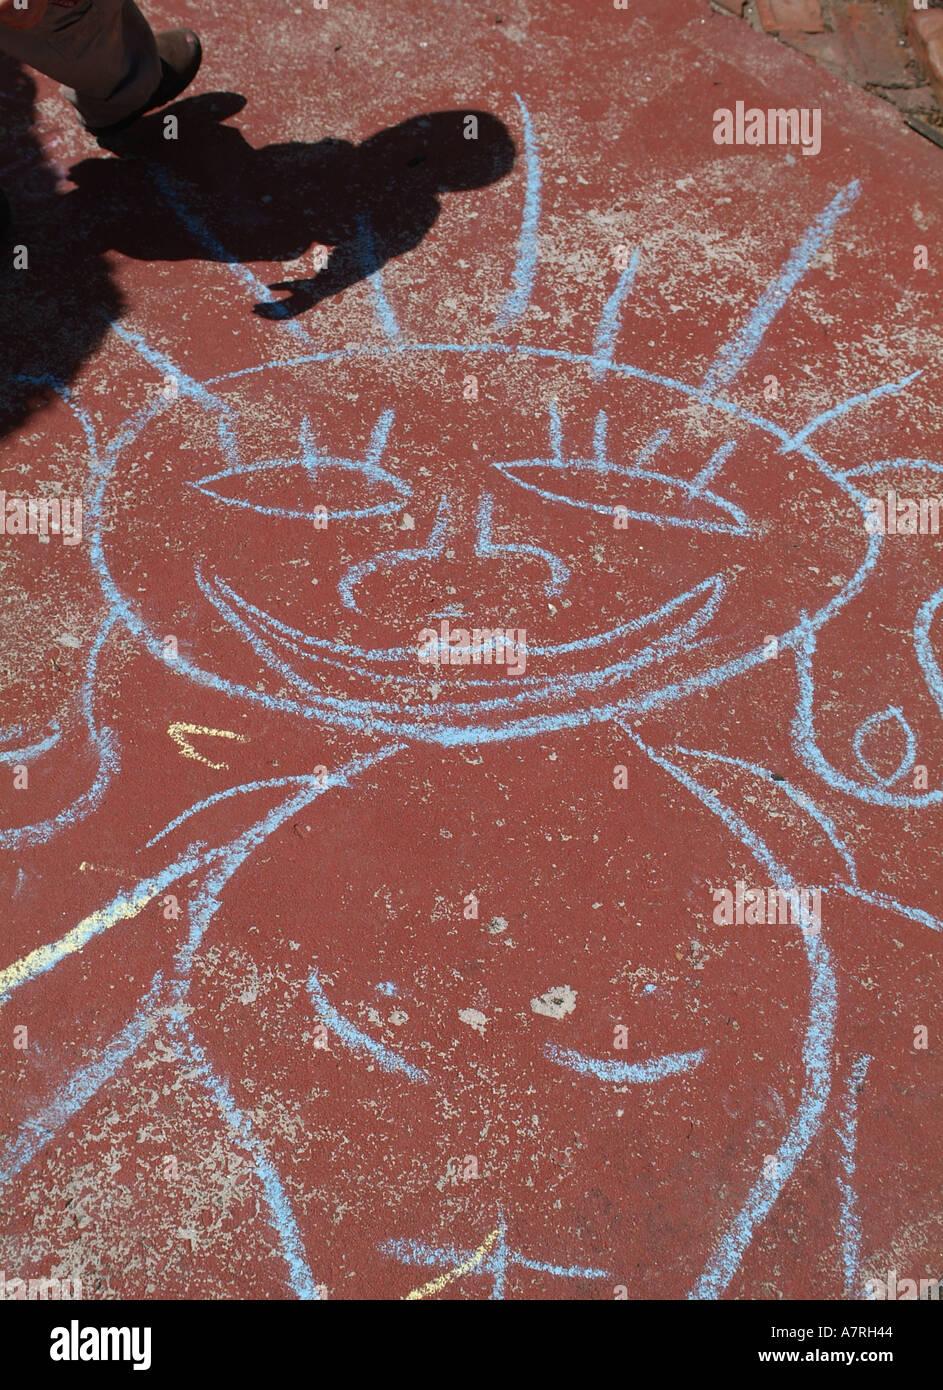 Odd street art chalk drawing figure with shadow Stock Photo